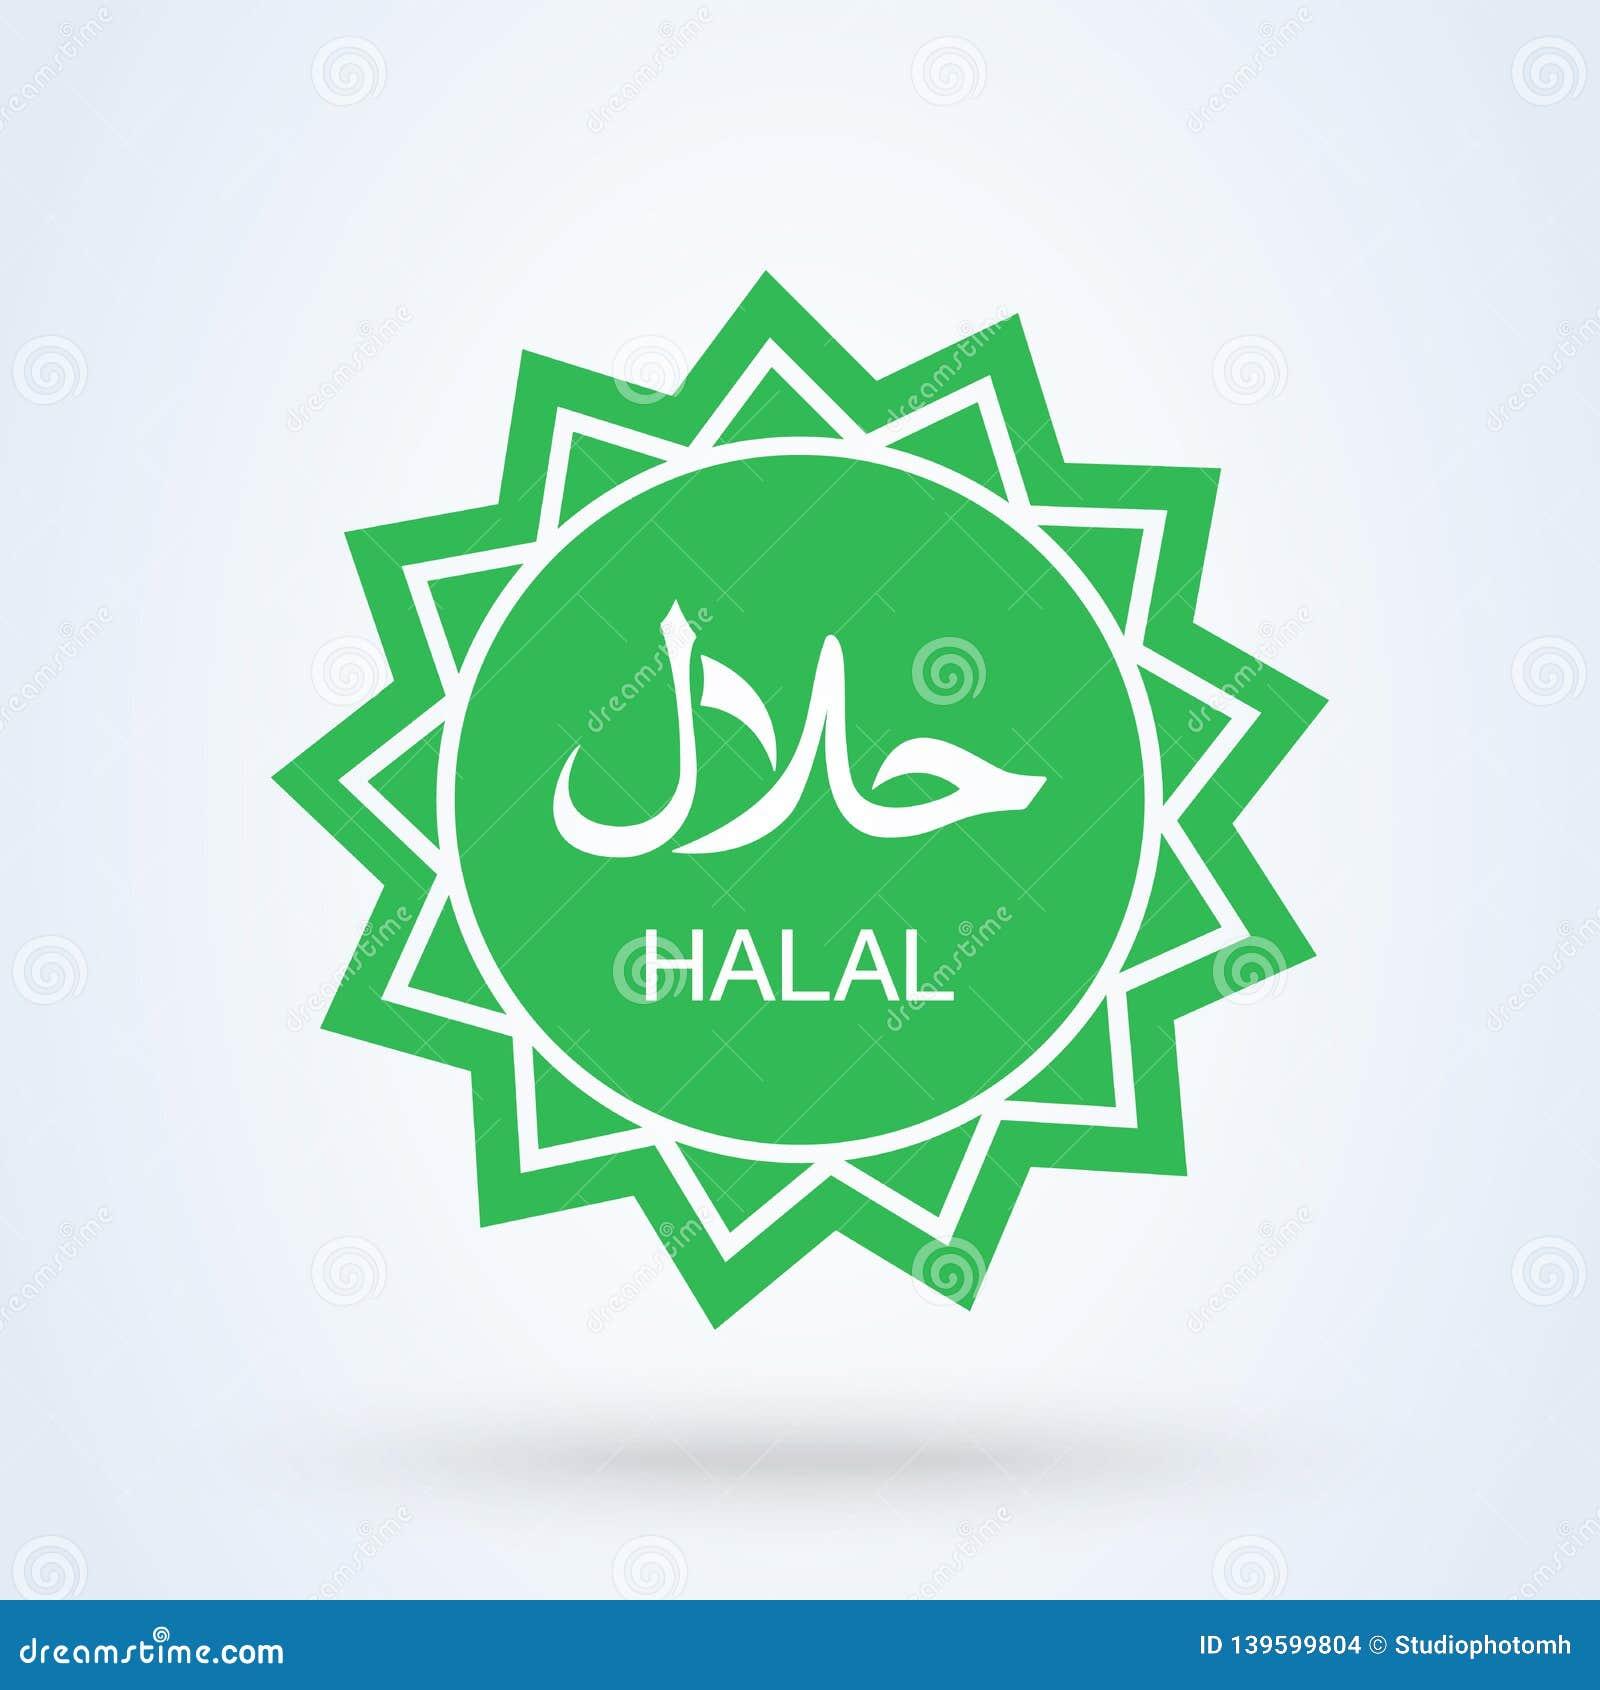 Halal Food Logo Vector Halal Sign Design Green Certificate Tag Stock Vector Illustration Of Logo Icon 139599804